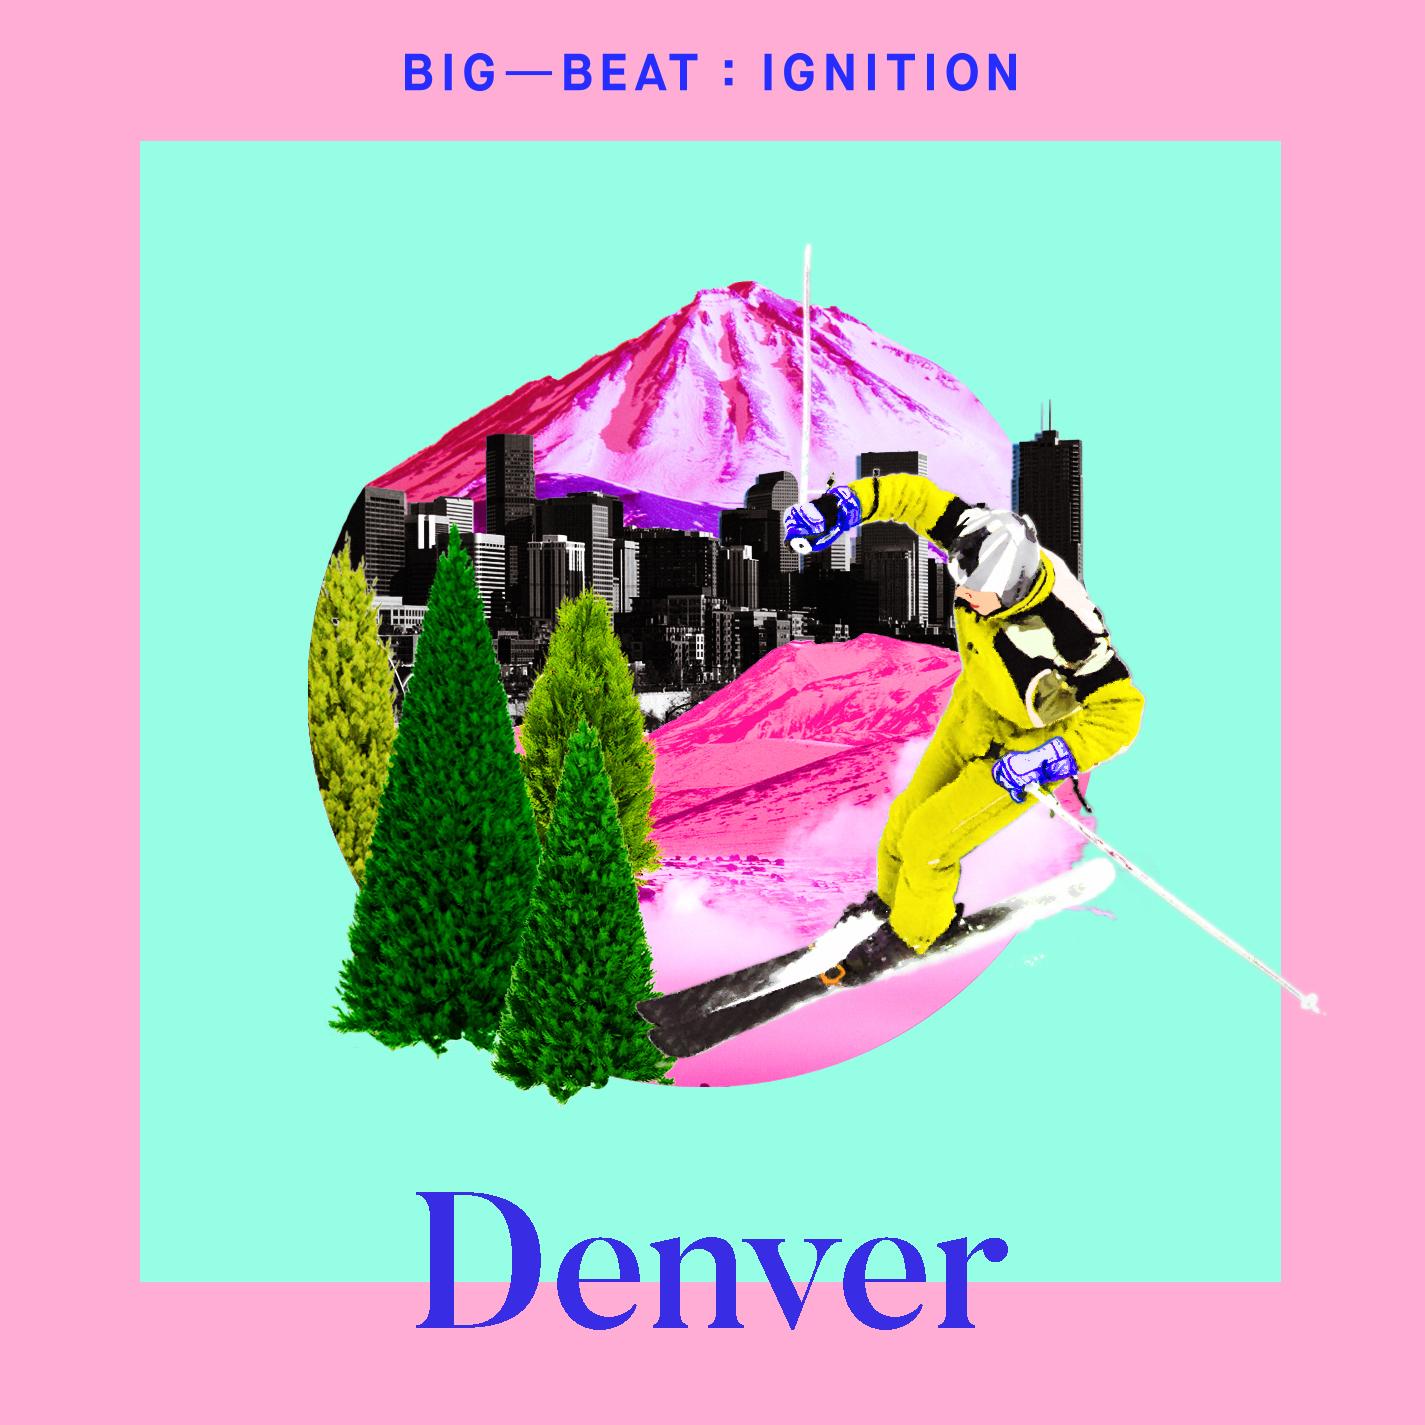 SINGLE - Big beat ignition |Late night radio | 2017